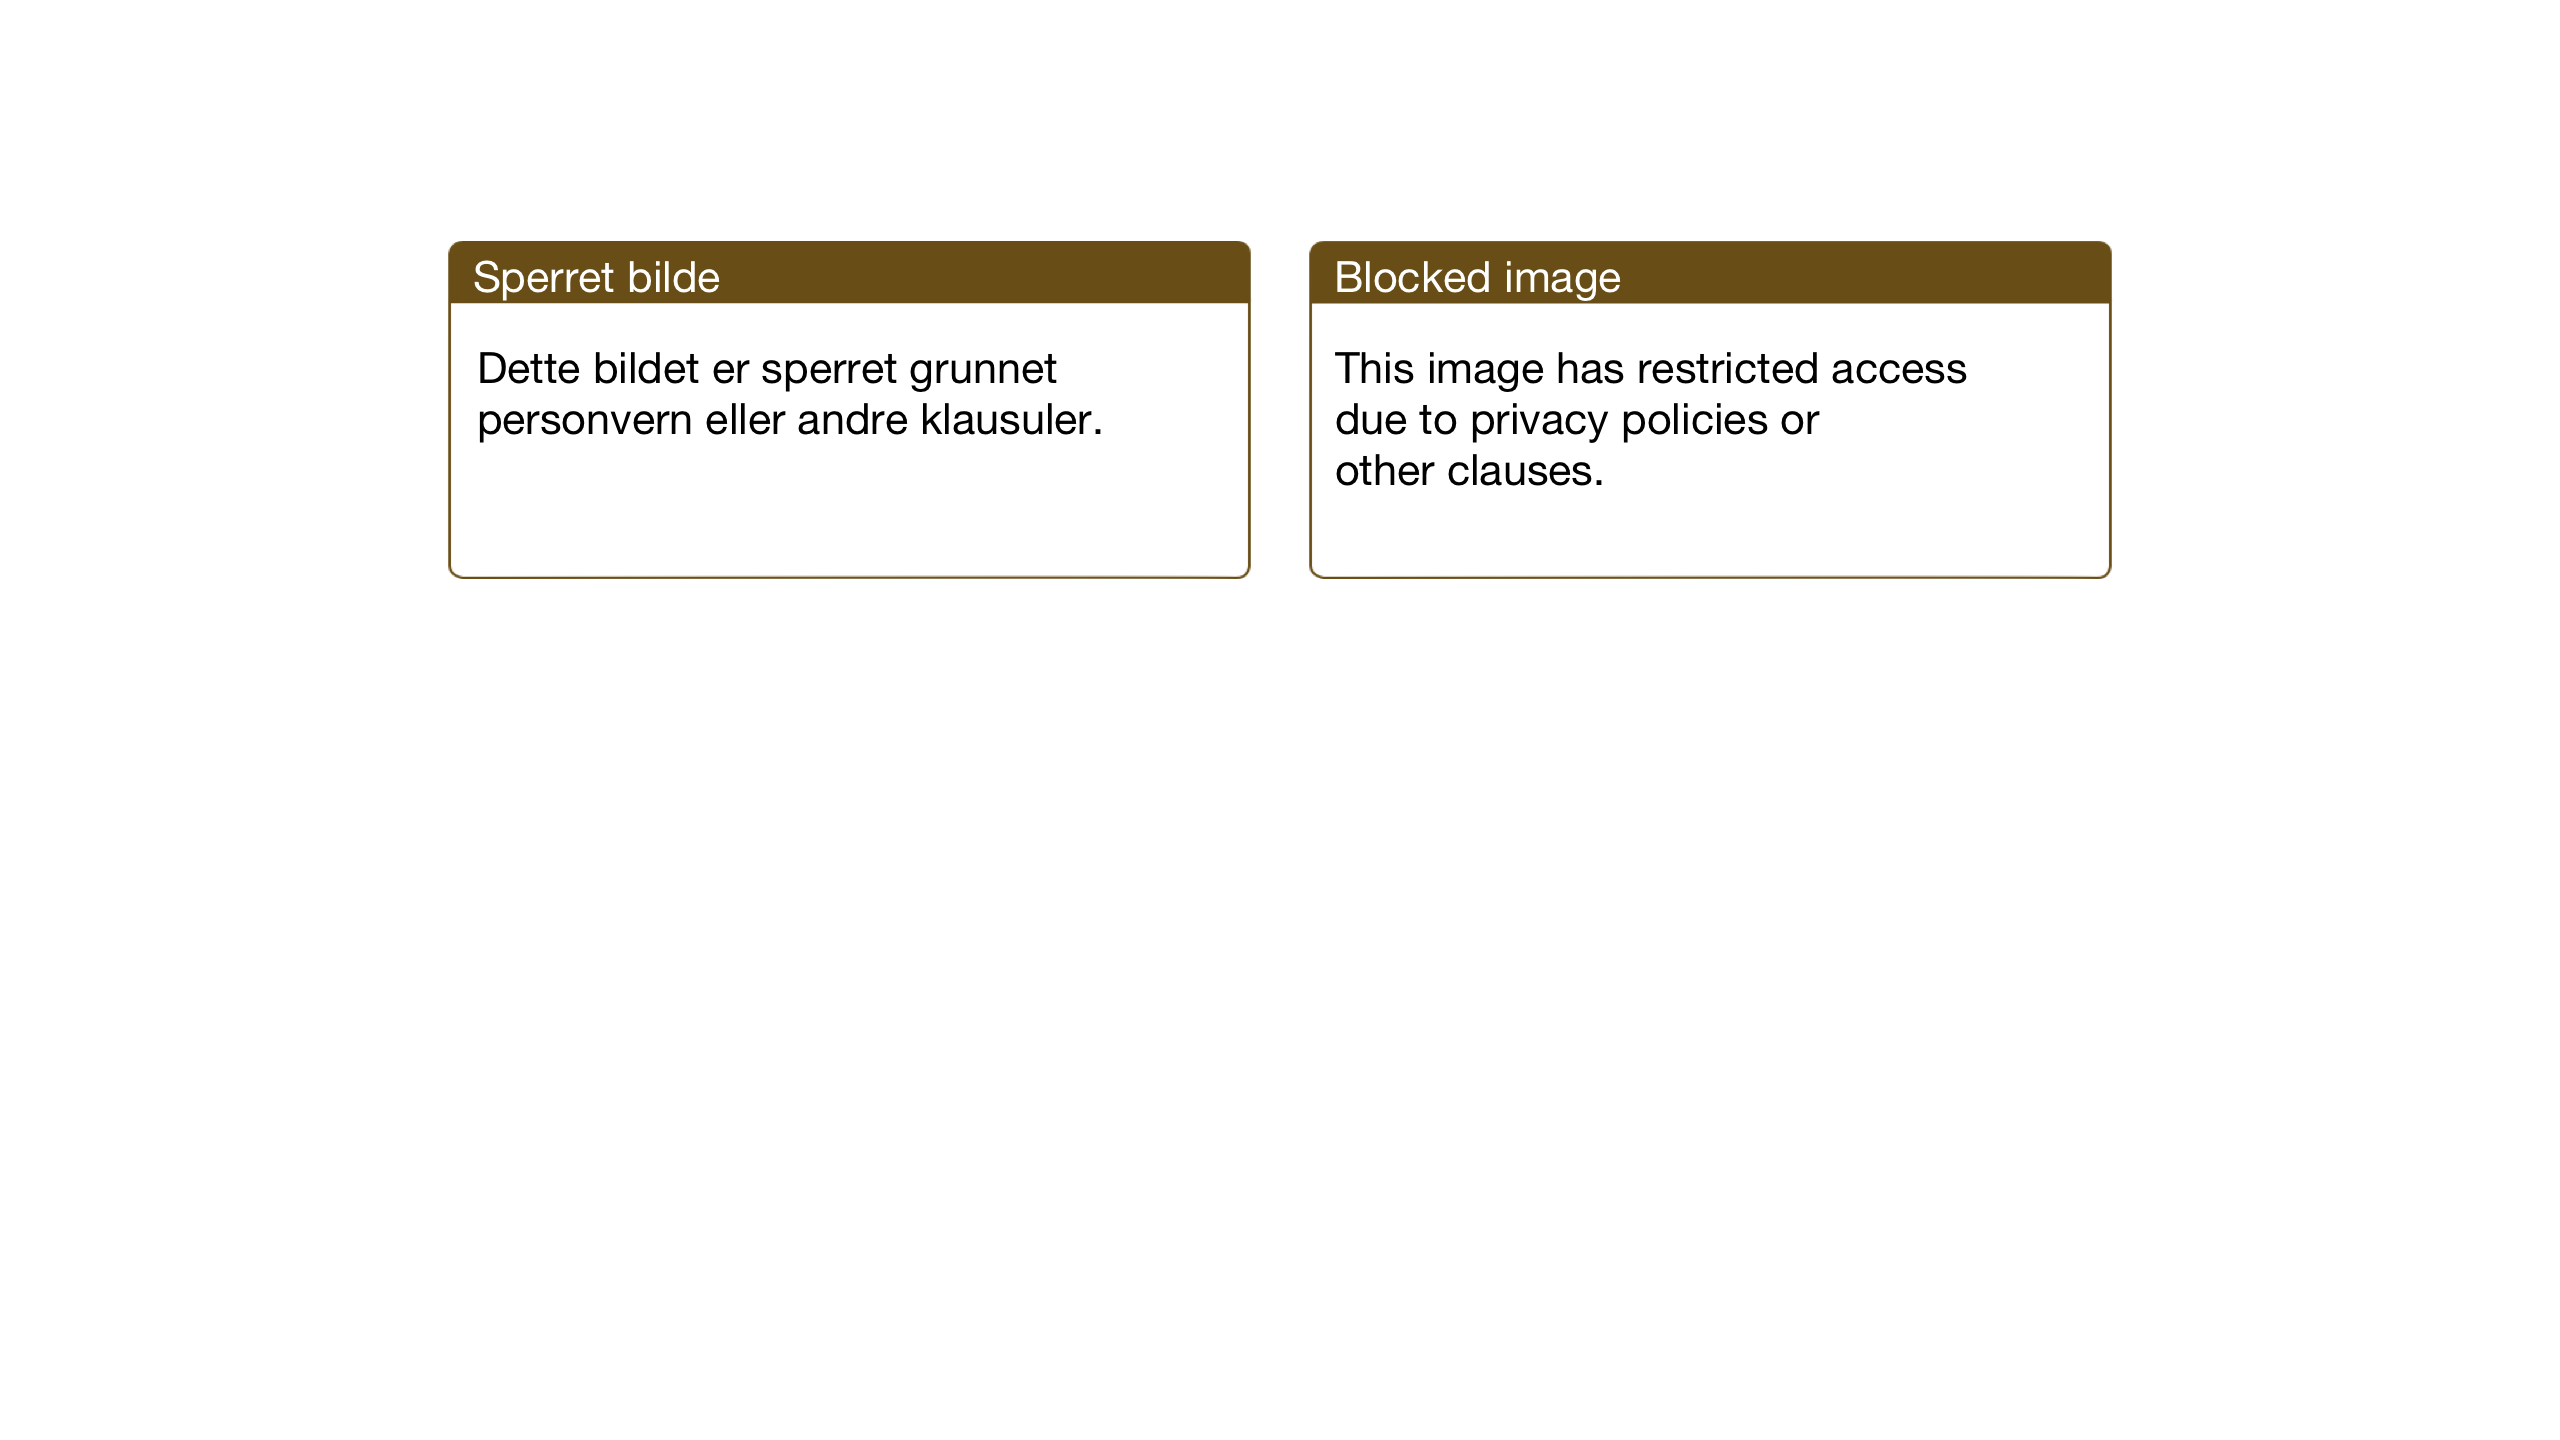 RA, Justisdepartementet, Politiavdelingen (RA/SDJ-6873), 1996, s. 1